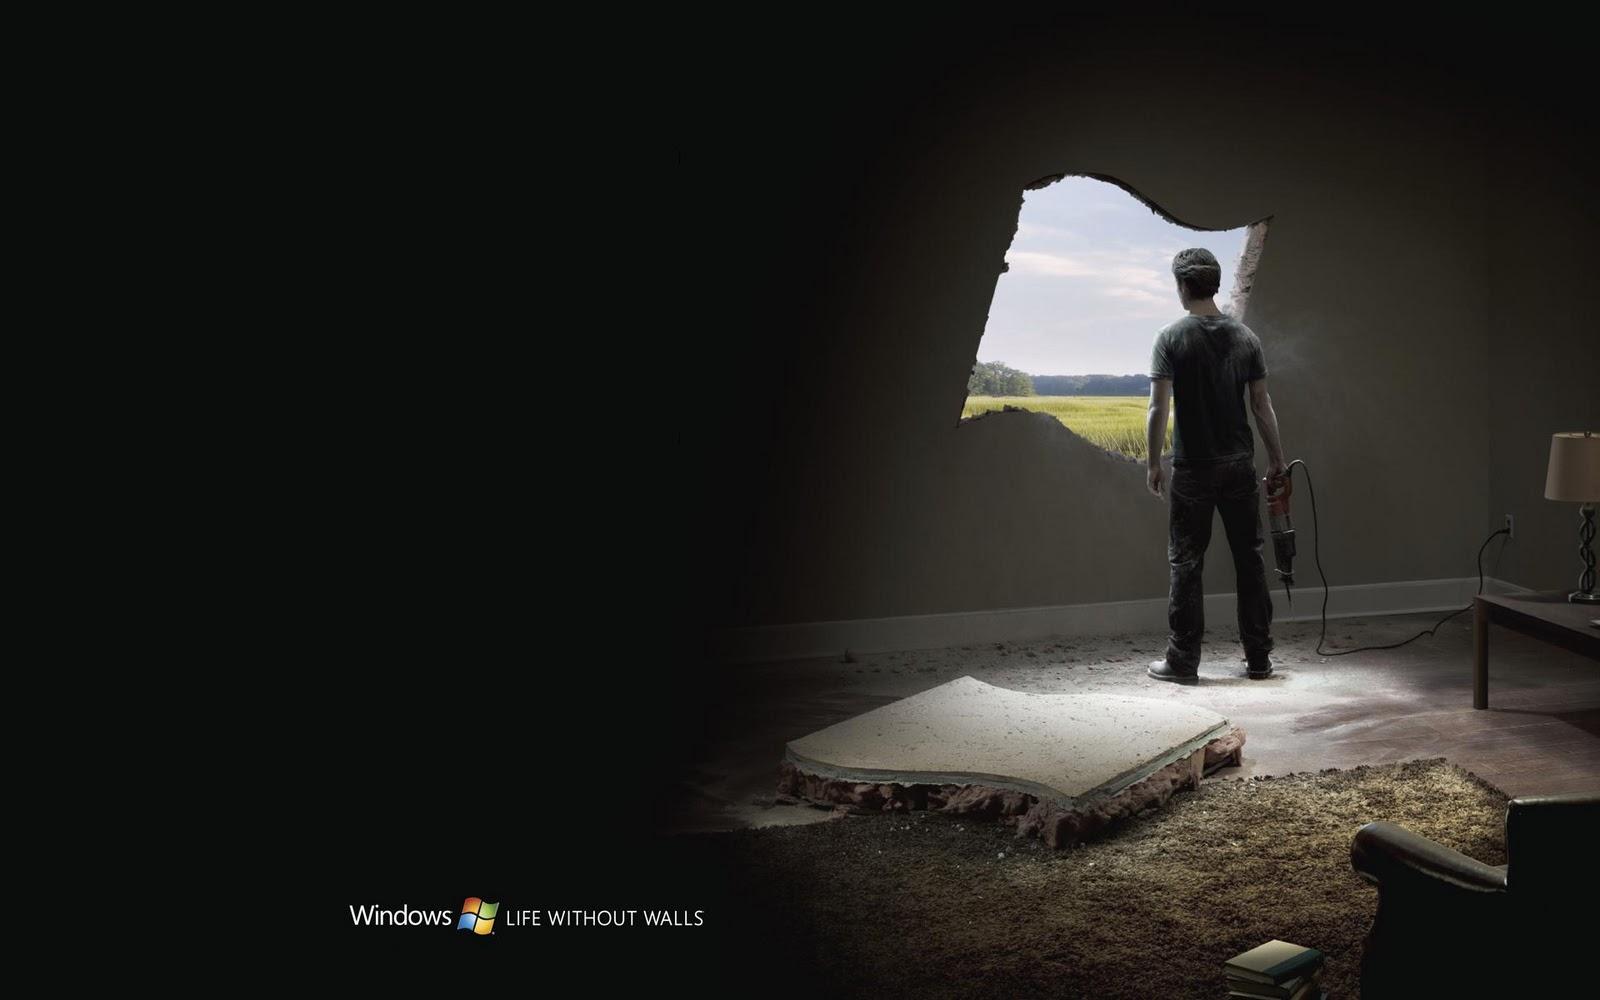 Hd Wallpaper Of Girls Windows 7 Hd Wallpapers C Hd Wallpapers